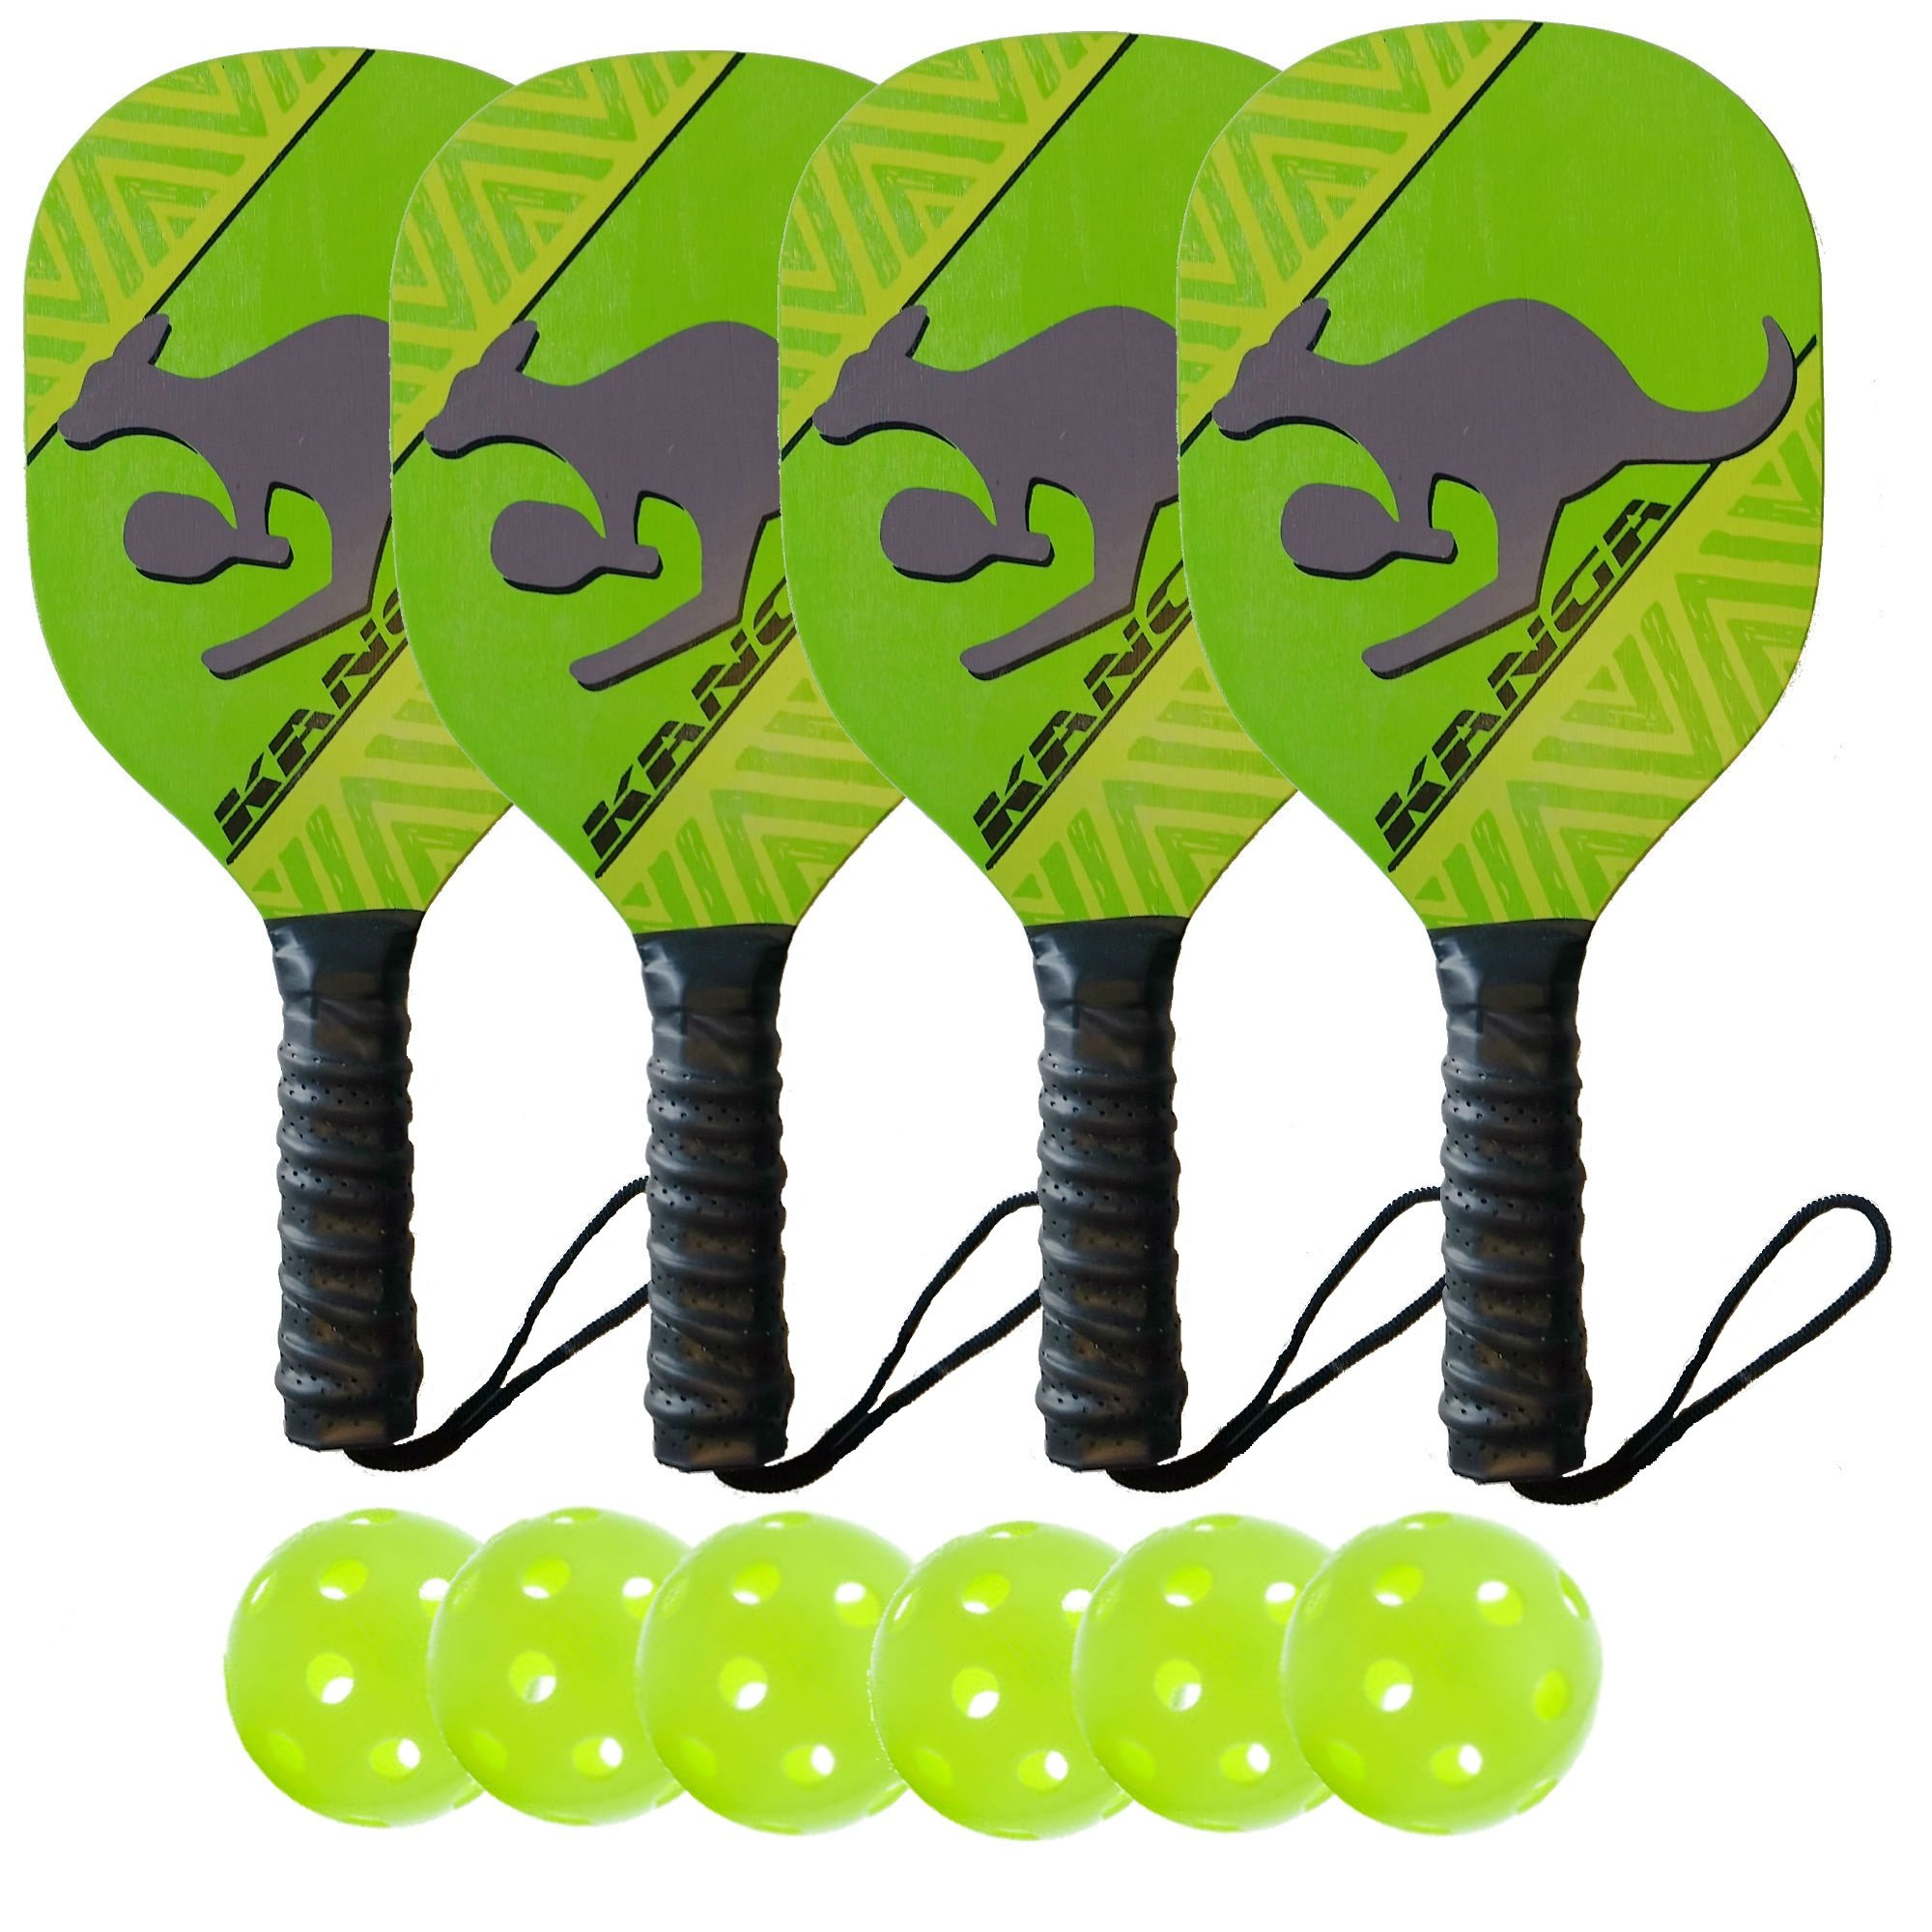 Kanga Beginner Pickleball Paddle Bundle   Set Includes 4 Pickleball Paddles/6 Pickleball Balls   Durable Wood Paddle Construction with Comfort Cushion Grip by PickleballCentral